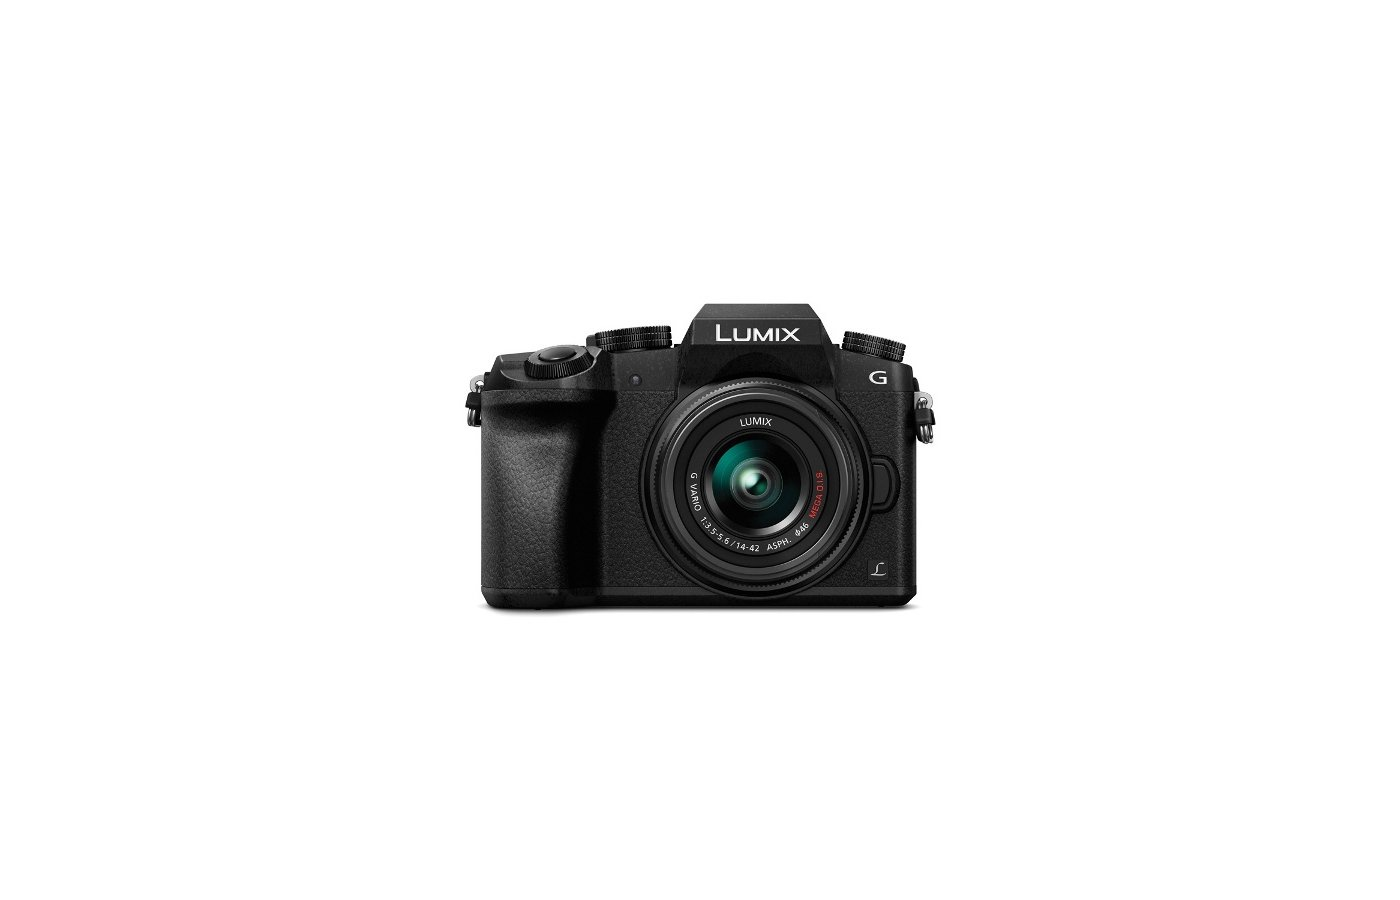 Фотоаппарат со сменной оптикой PANASONIC Lumix DMC-G7KEE-K Kit 14-42mm / F3.5-5.6 II ASPH. / MEGA O.I.S. lens